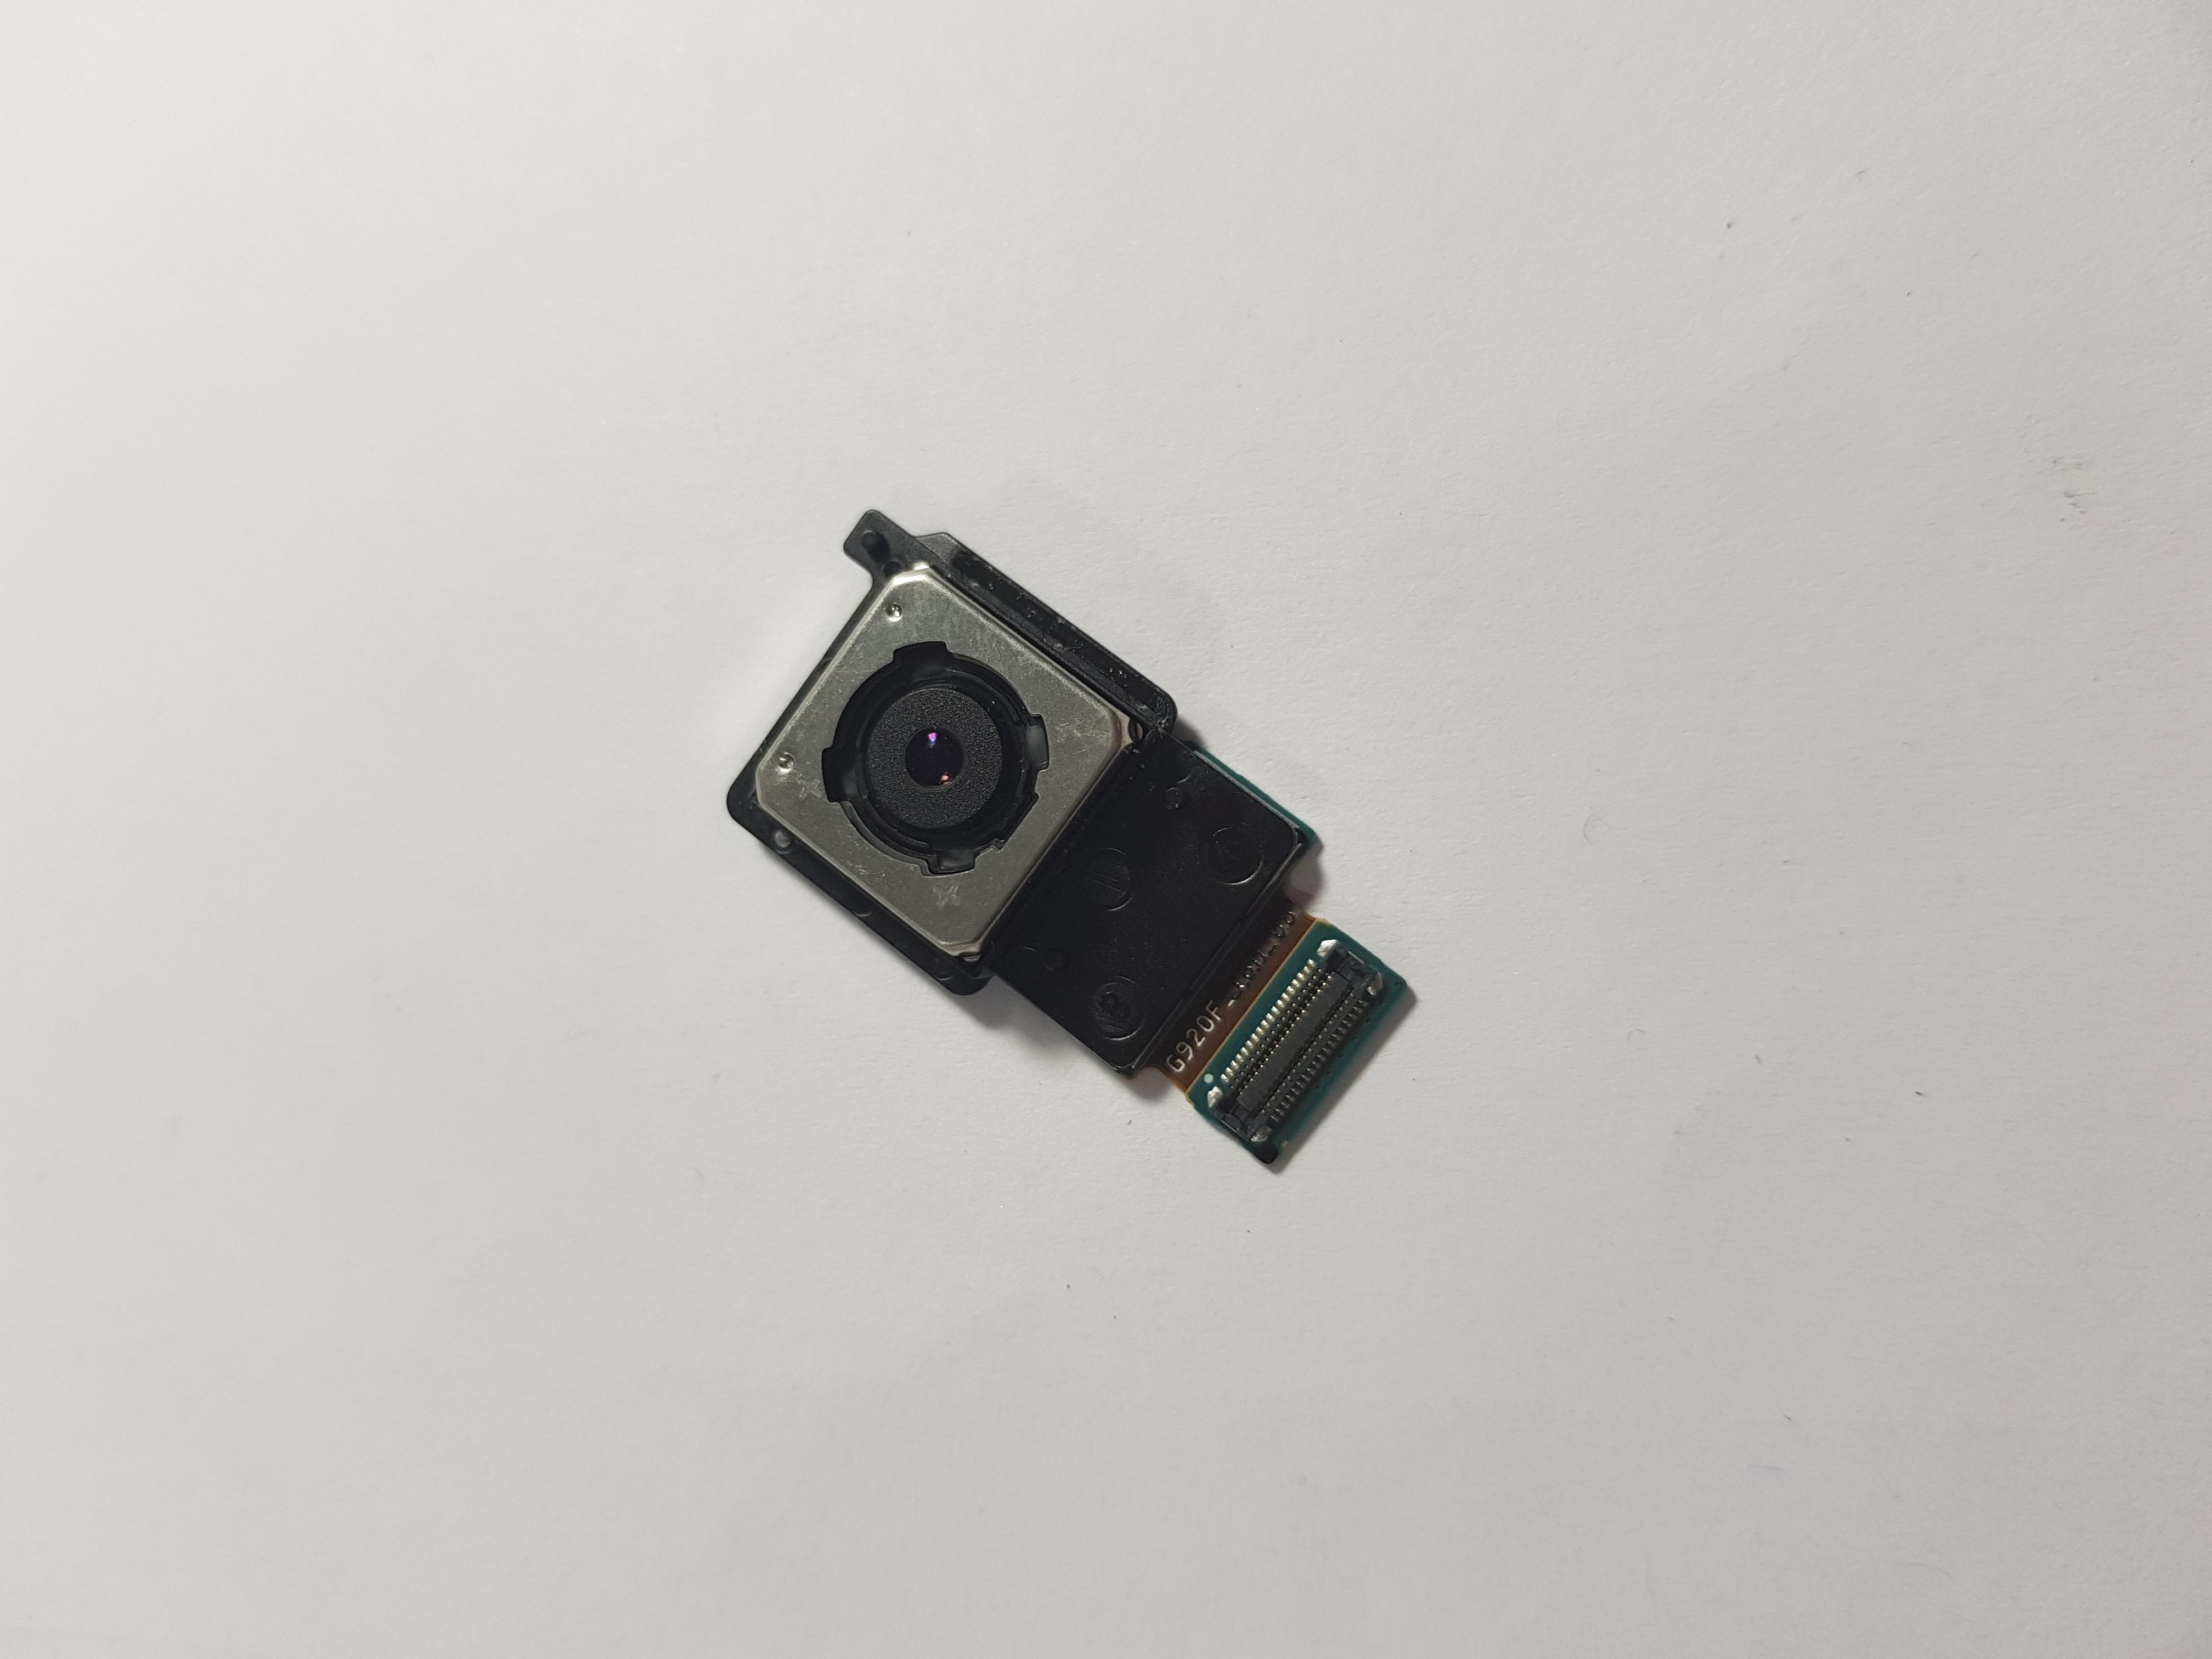 Camera foto principala samsung s6 g920 swap originala [0]